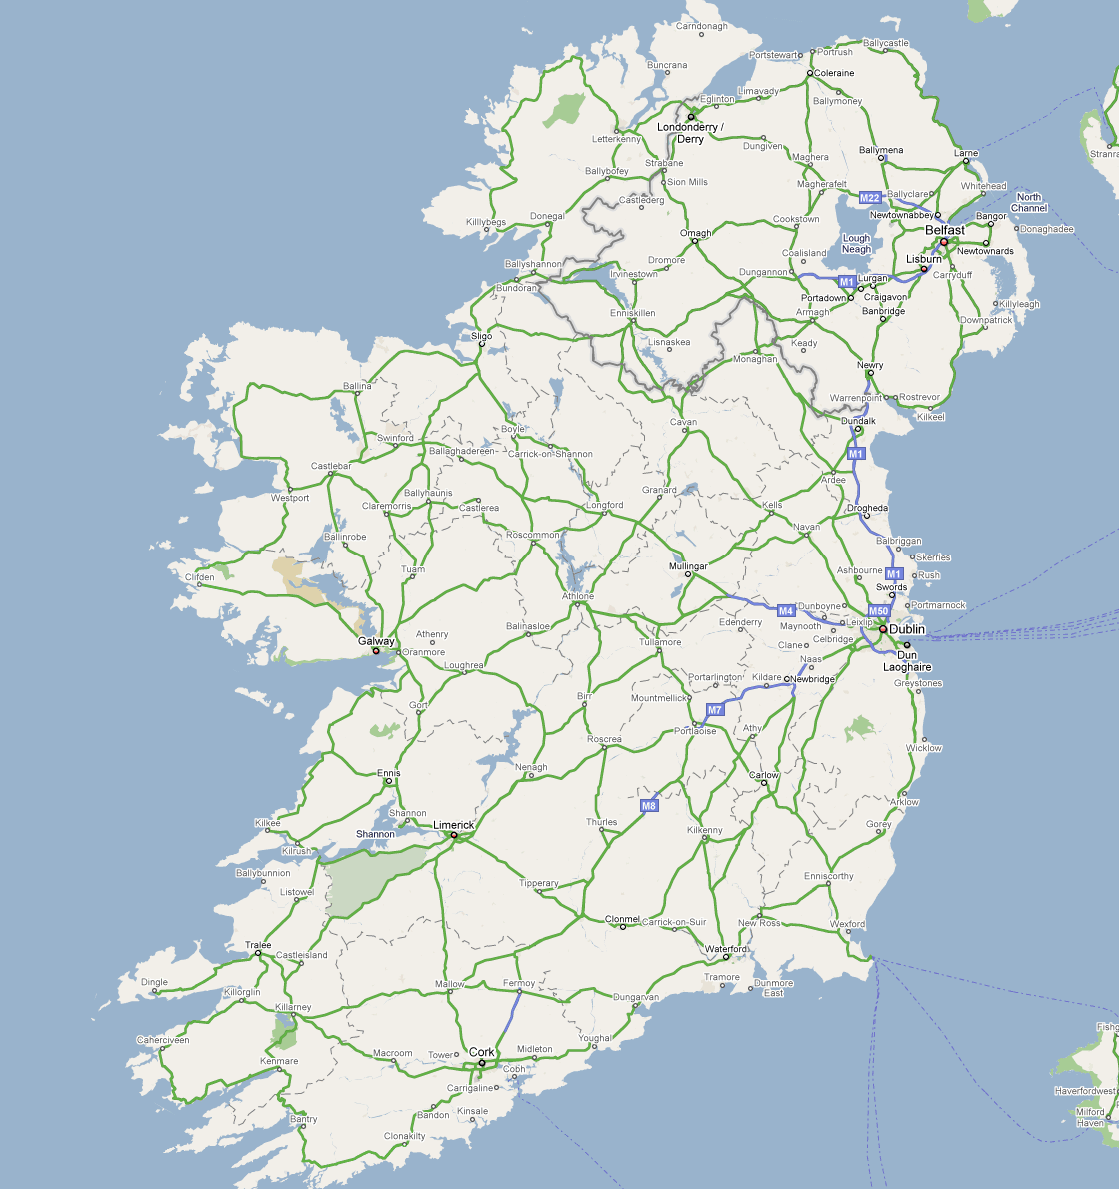 Map Of Ireland Highways.Irl Ireland Road Infrastructure Motorways Page 19